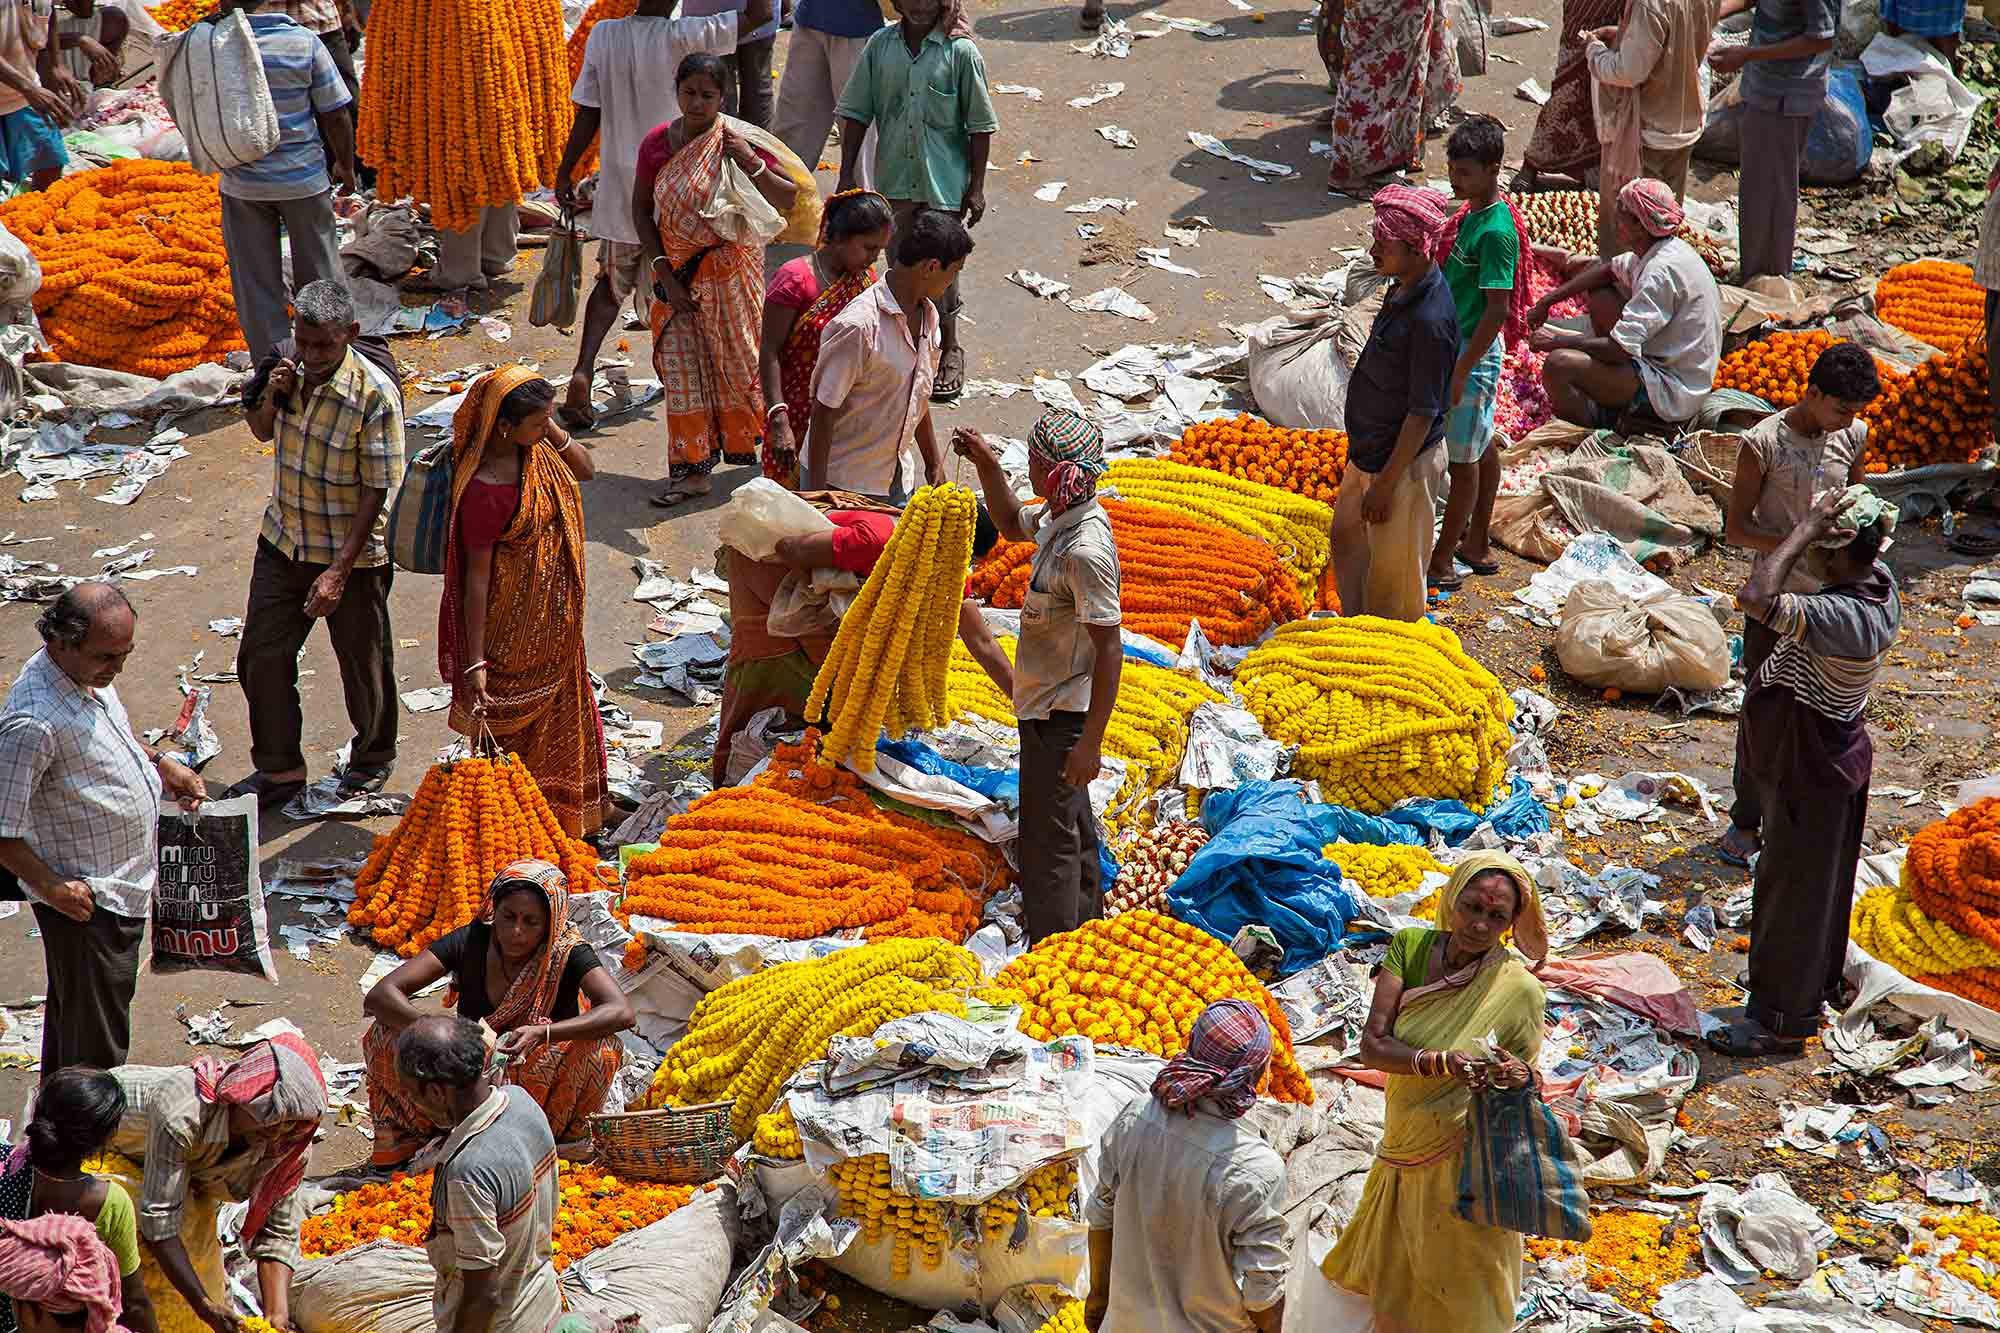 At the Mullik Ghat Flower Market in Kolkata, India. © Ulli Maier & Nisa Maier